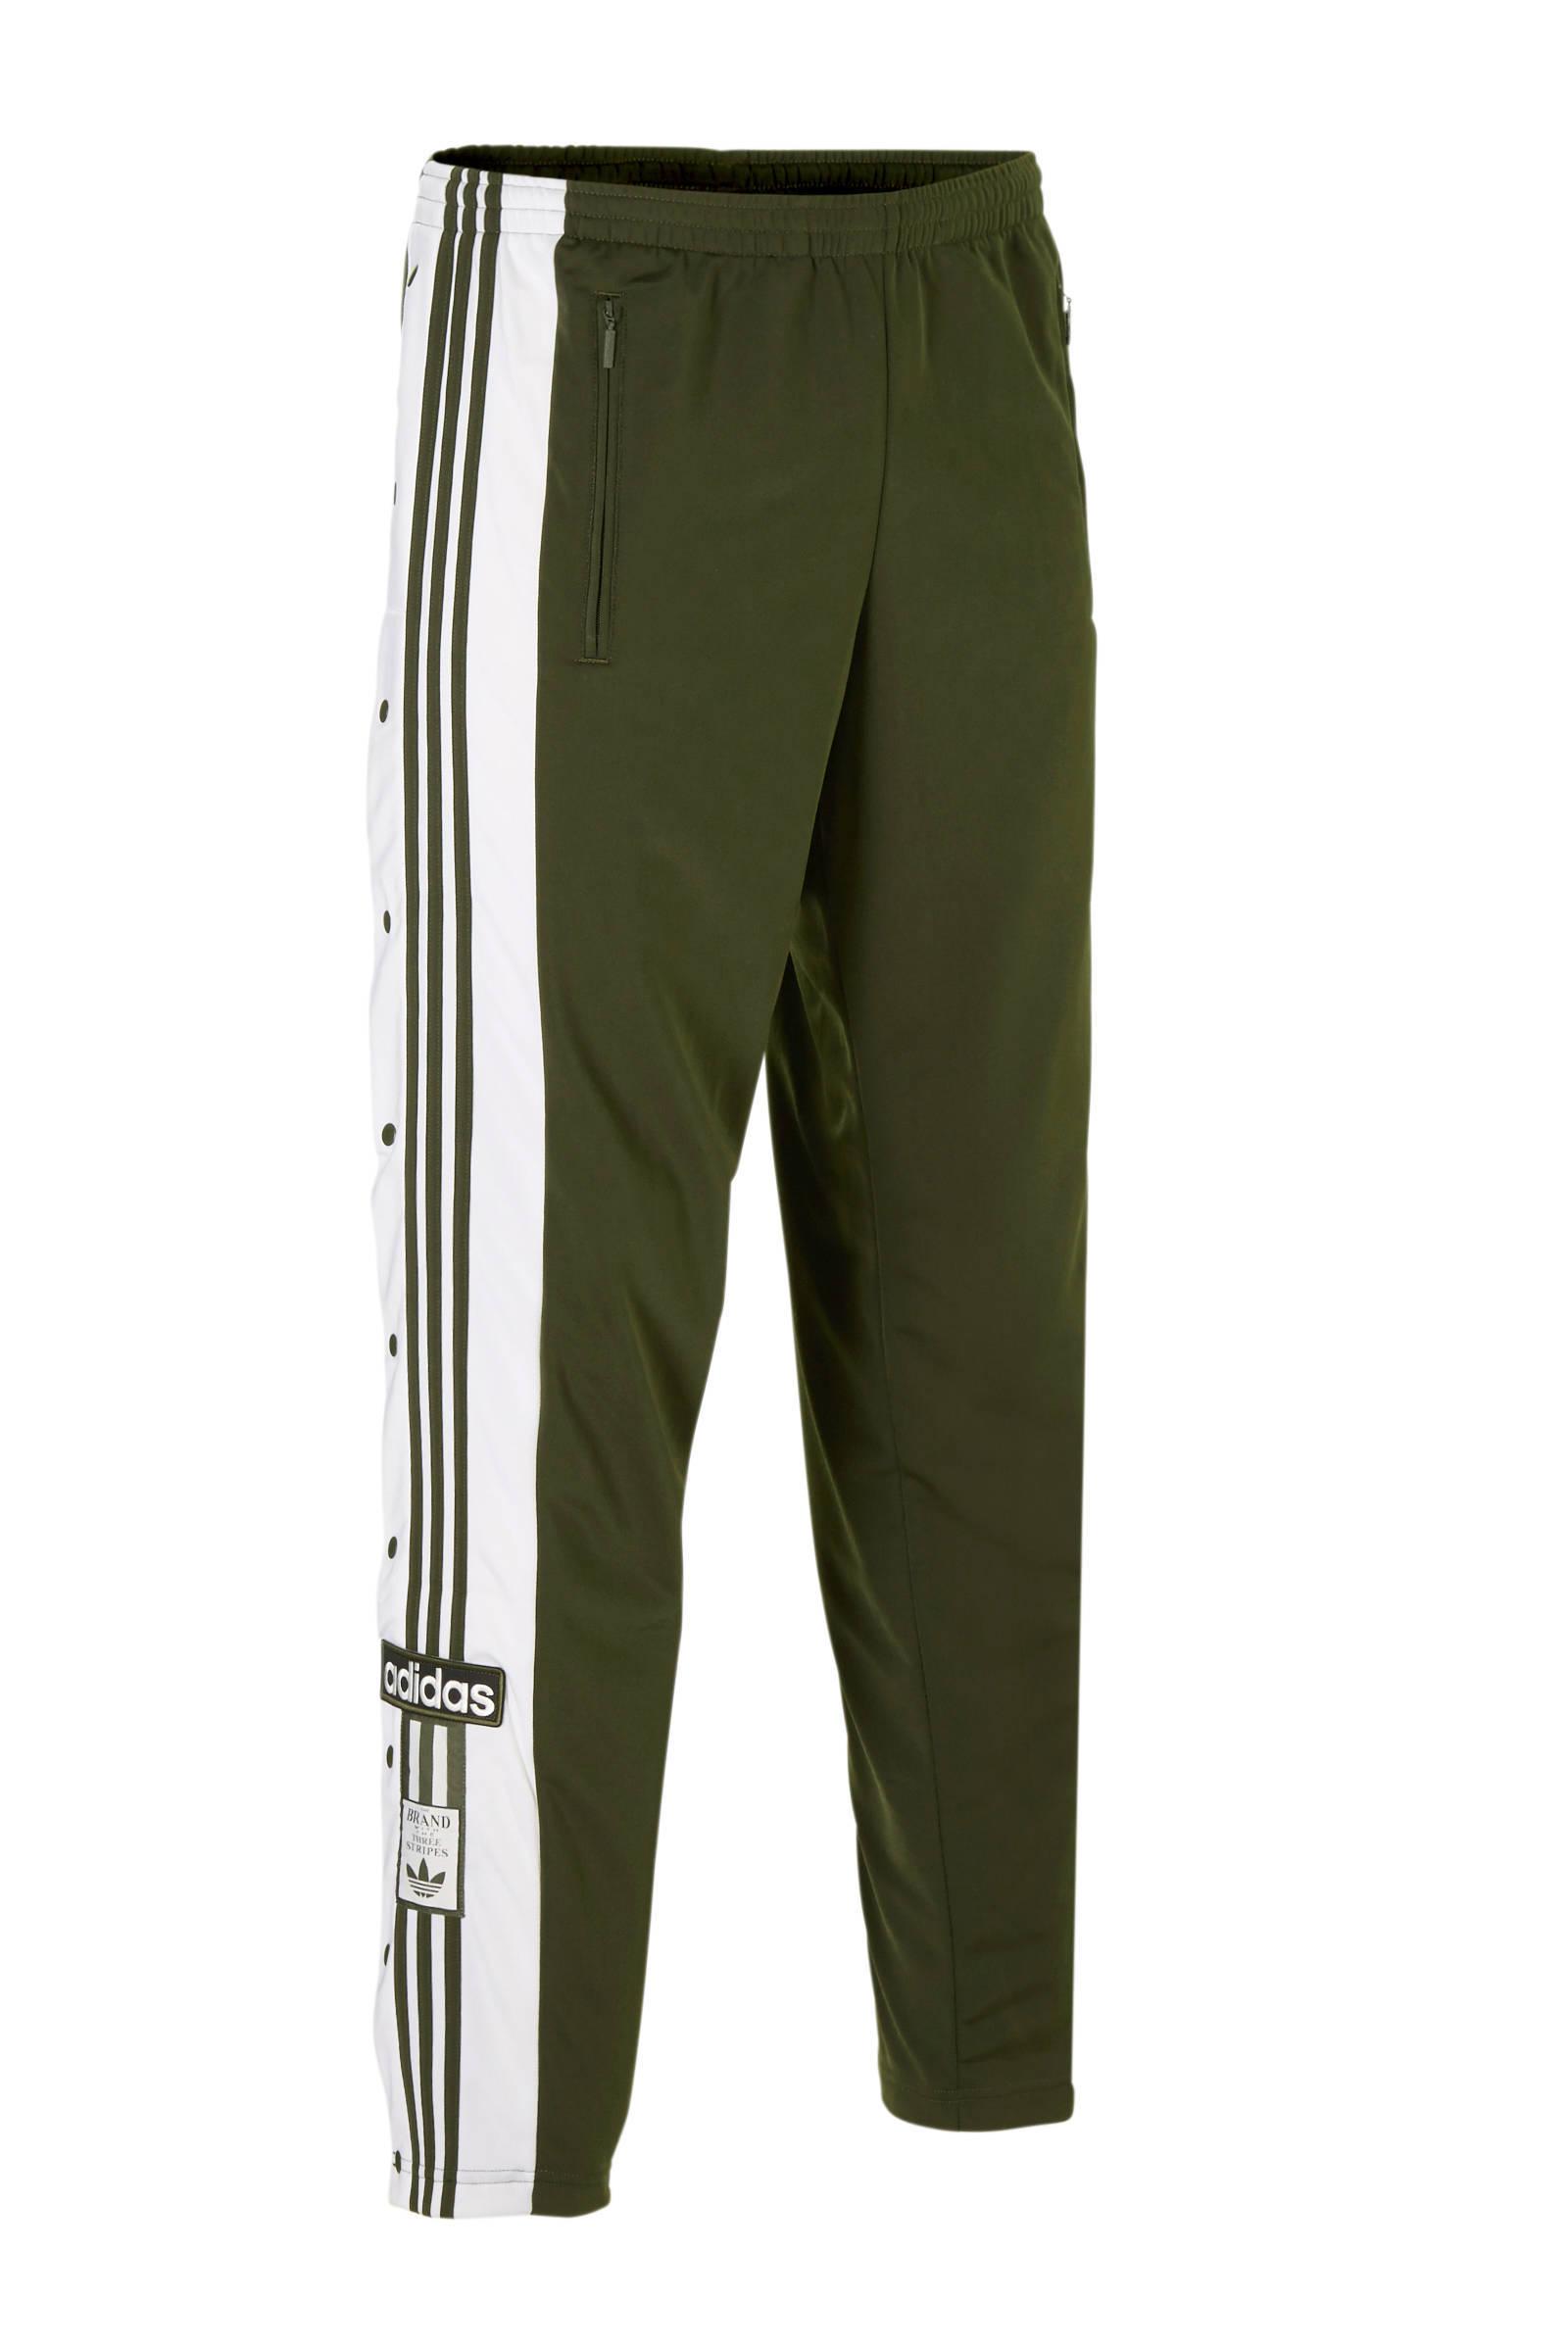 Wehkamp Adidas Adidas Originals Groen Originals Trainingsbroek wvvZ0Pq